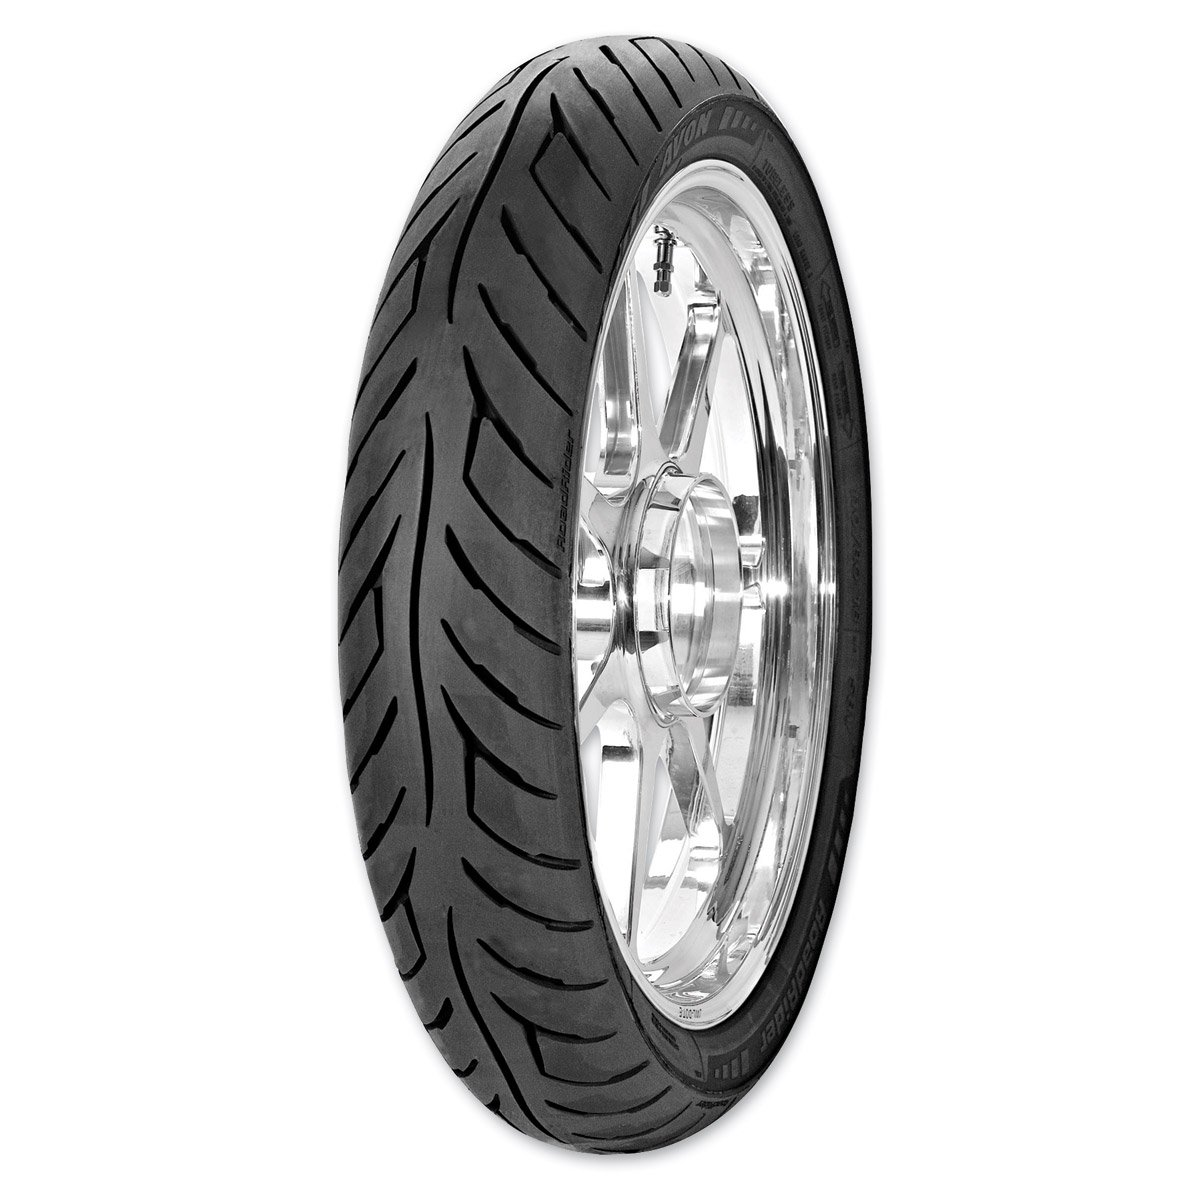 Avon AM26 Roadrider 3.25-19 Front/Rear Tire 2267513 by Avon (Image #1)